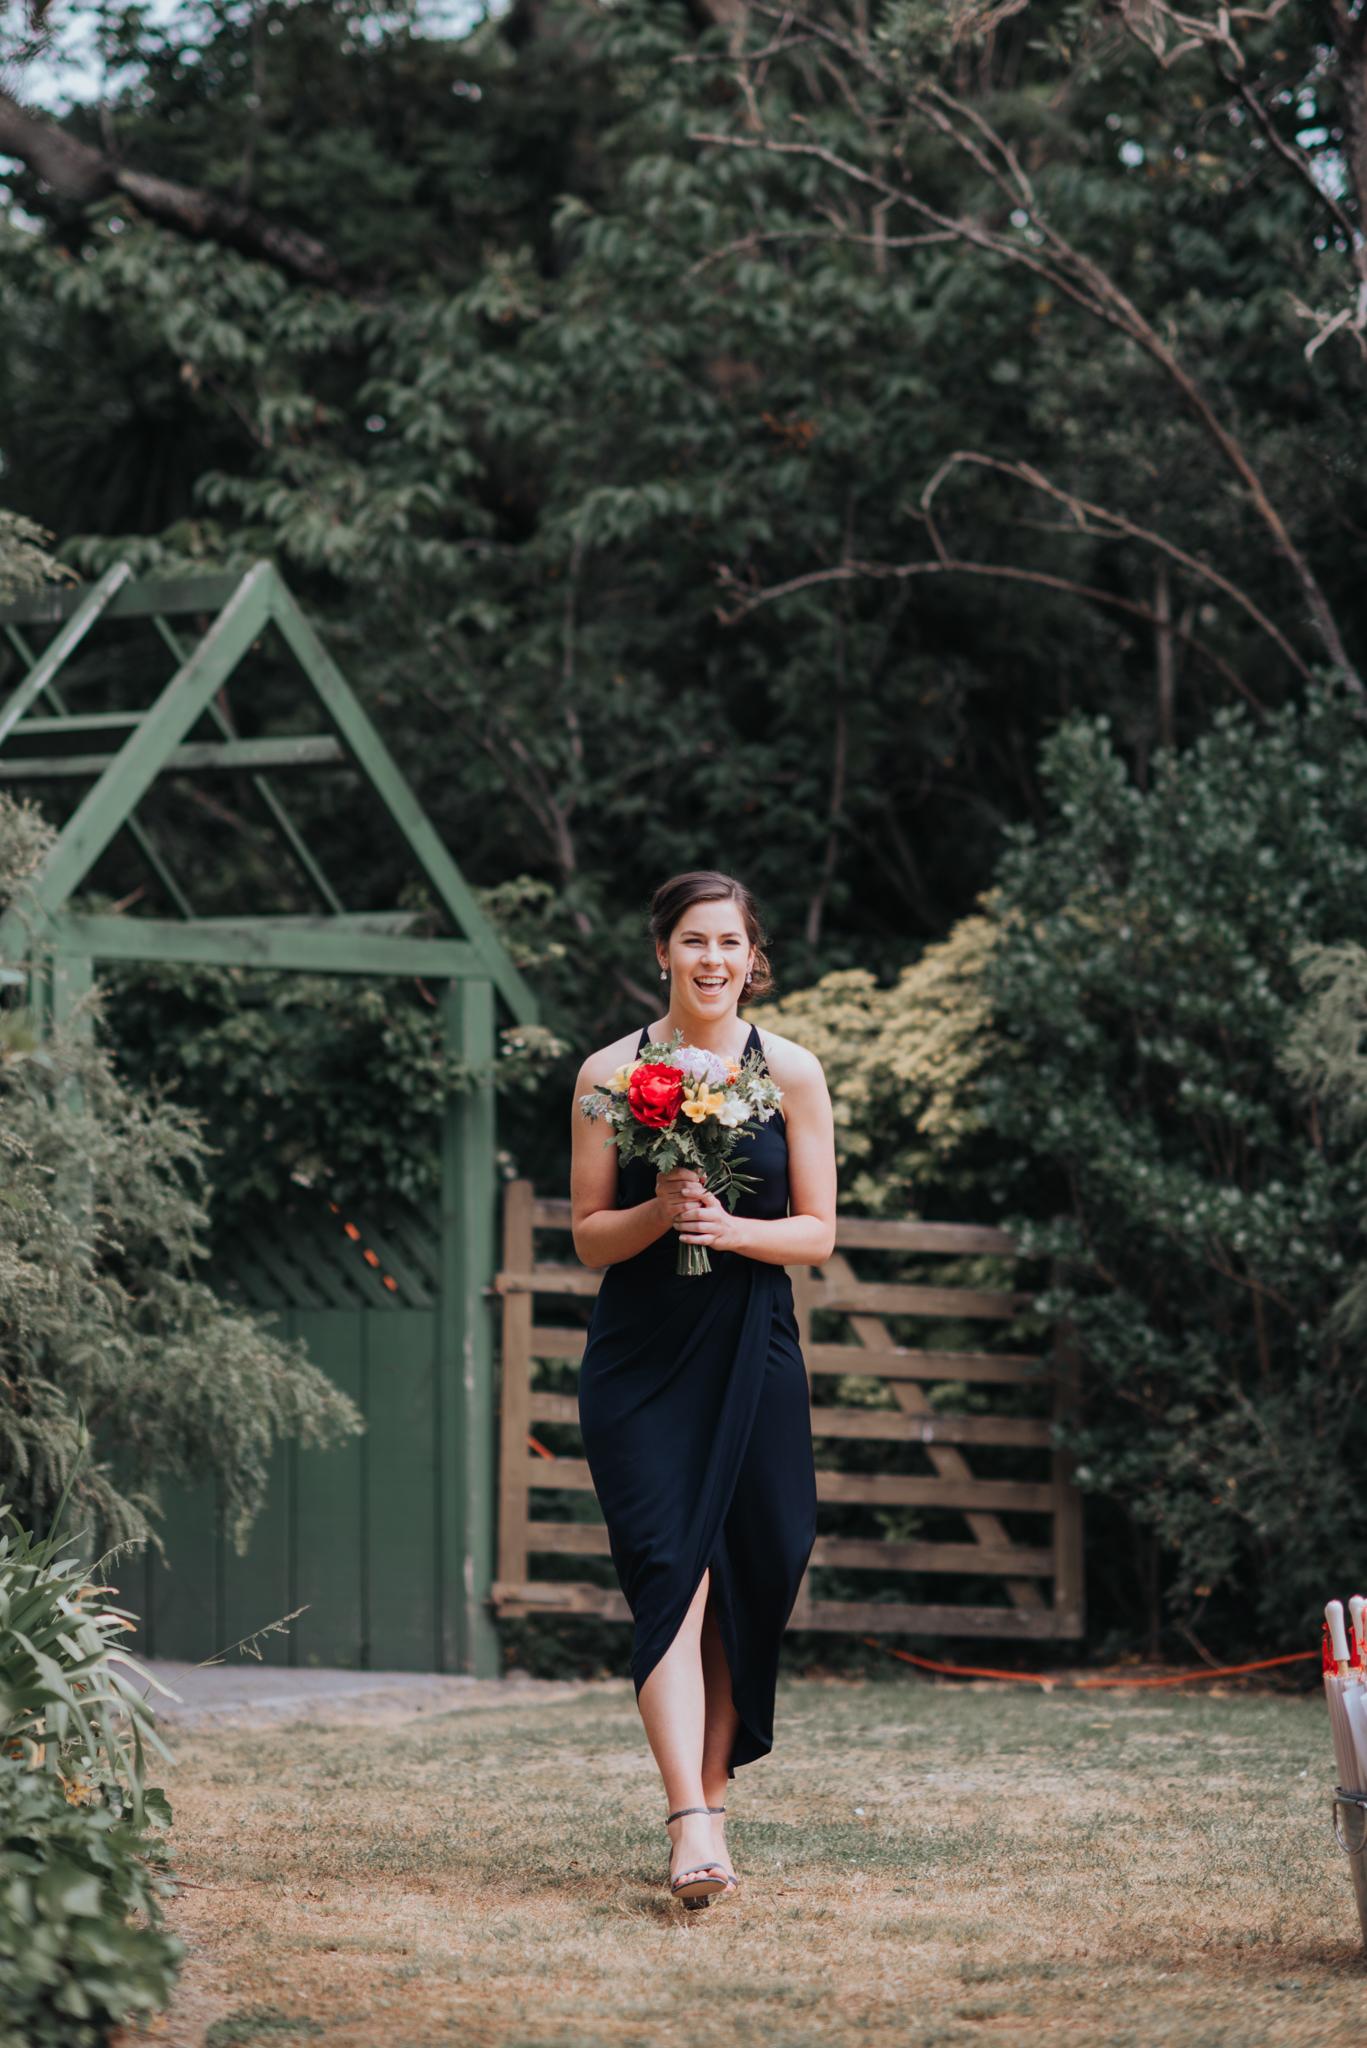 LOVELENSCAPES PHOTOGRAPHY • VISUAL POETRY • NEW ZEALAND WEDDING PHOTOGRAPHER • AUSTRALIAN WEDDING PHOTOGRAPHER • BRISBANE • MELBOURNE • SYDNEY • HOBART • TARUREKA ESTATE • ANNA CAMPBELL • 102.jpg